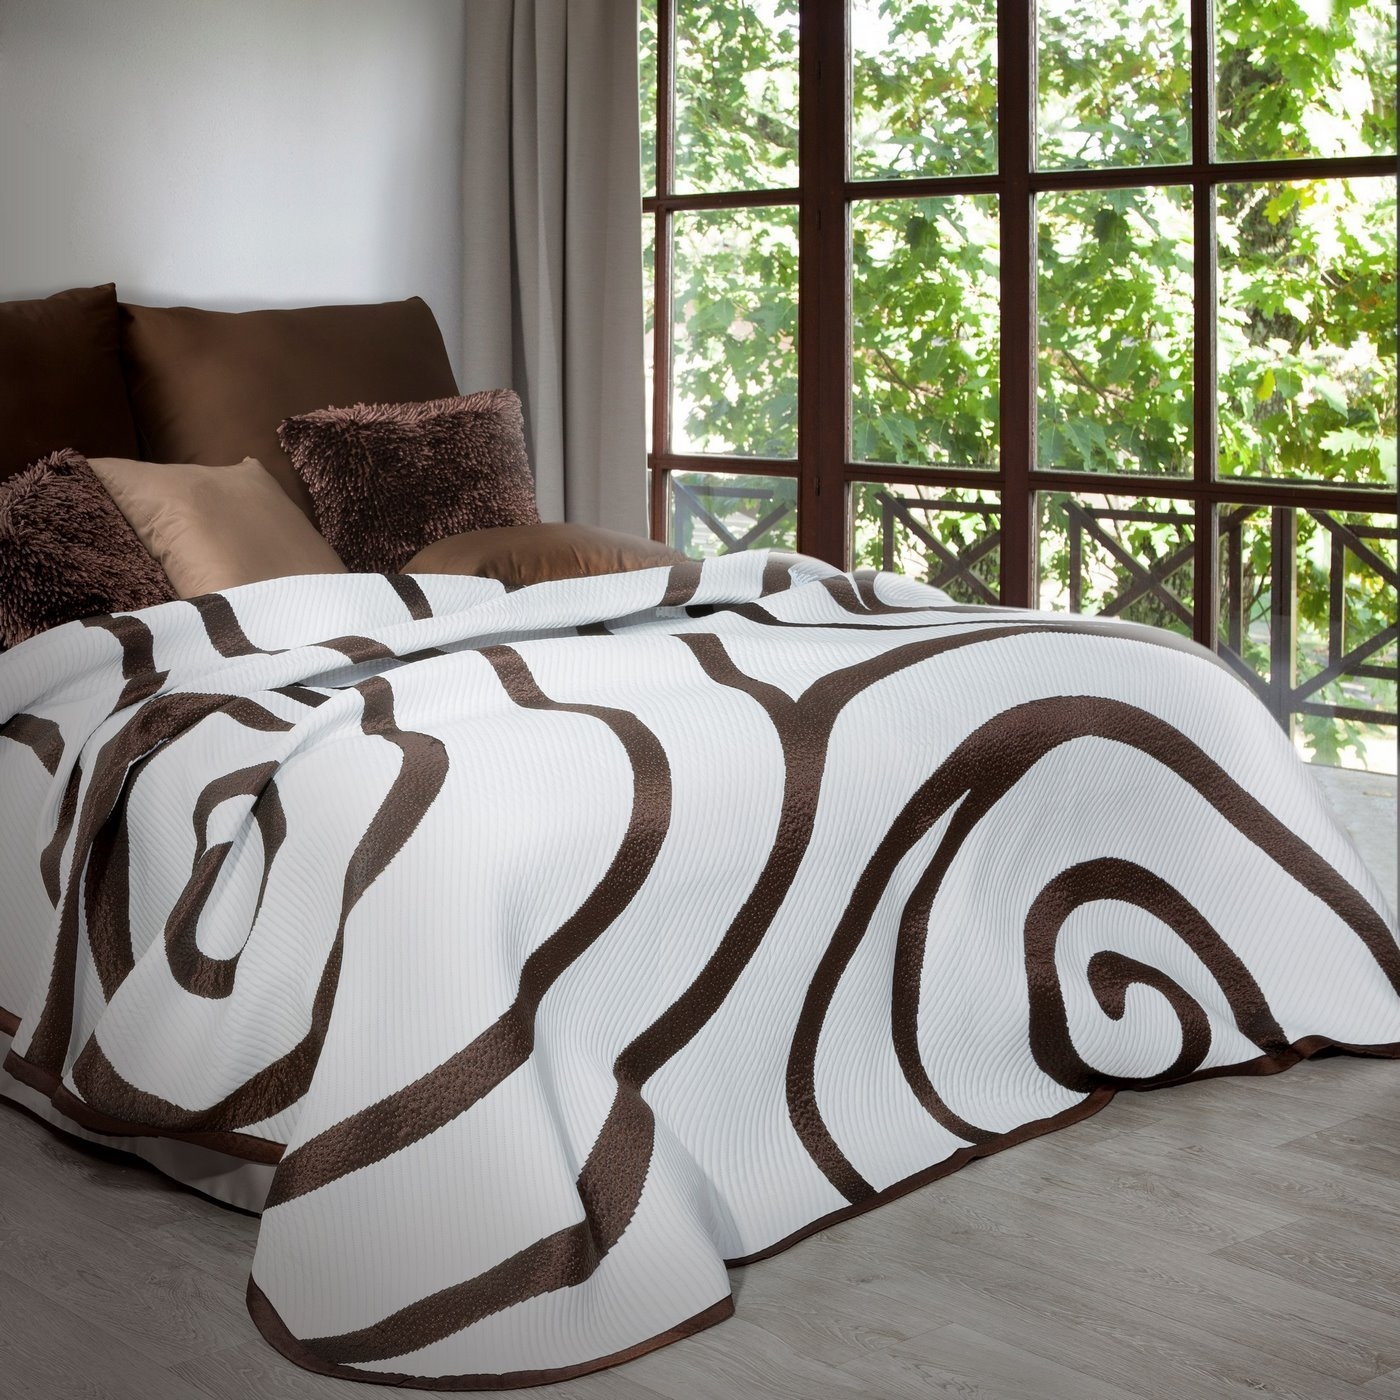 Cuvertura reversibila Victor White / Brown, 170 x 210 cm